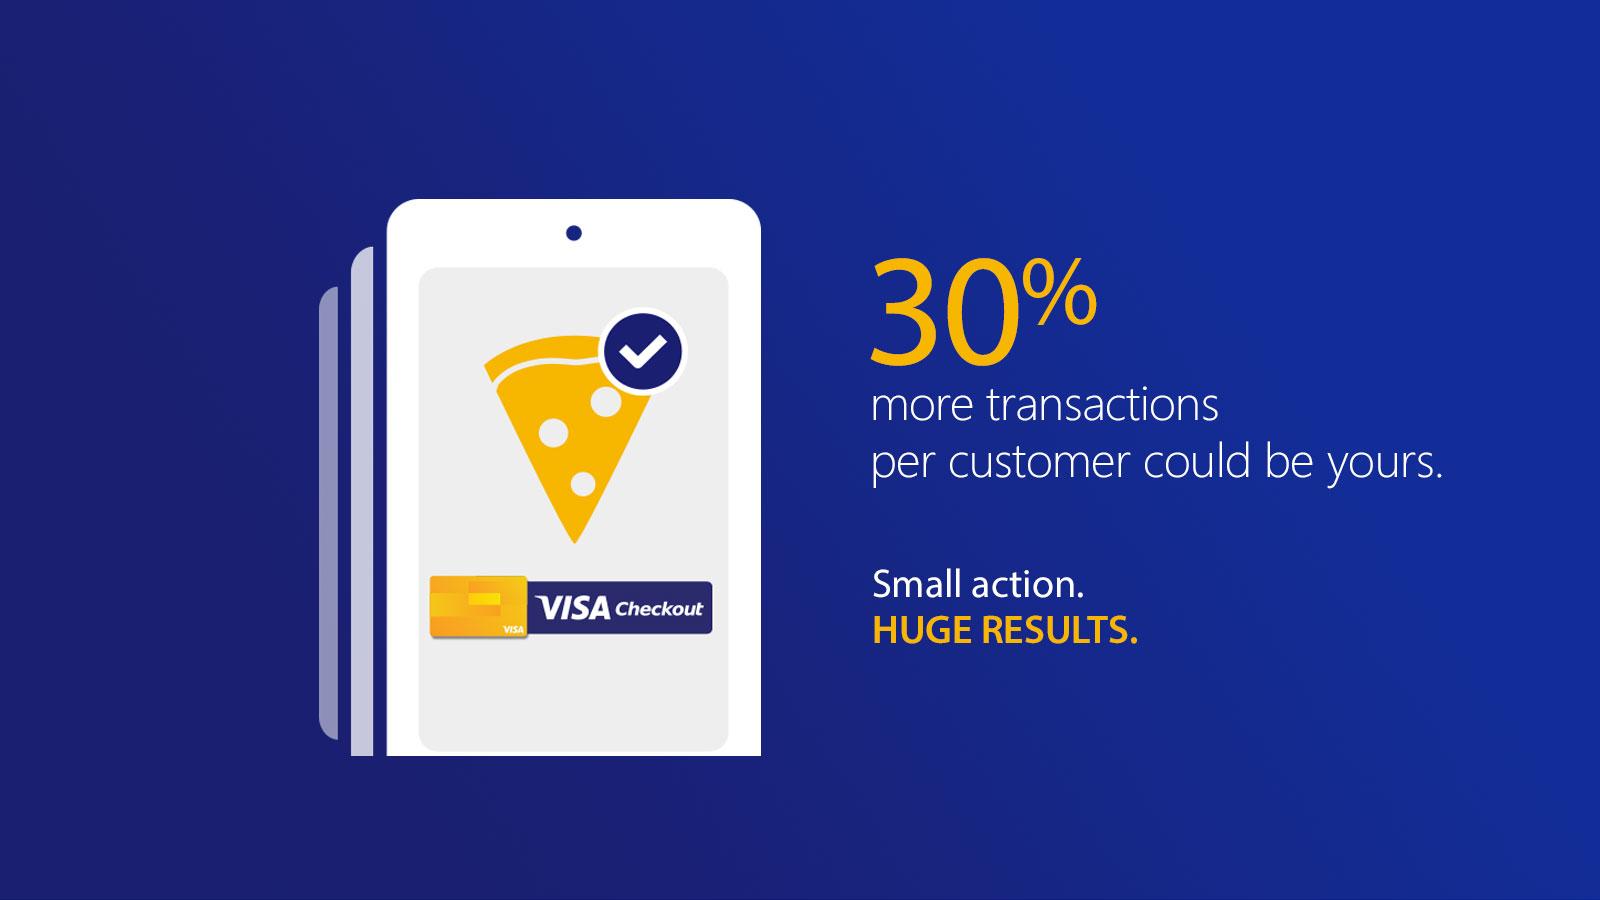 visa usa run your business small business tools visa